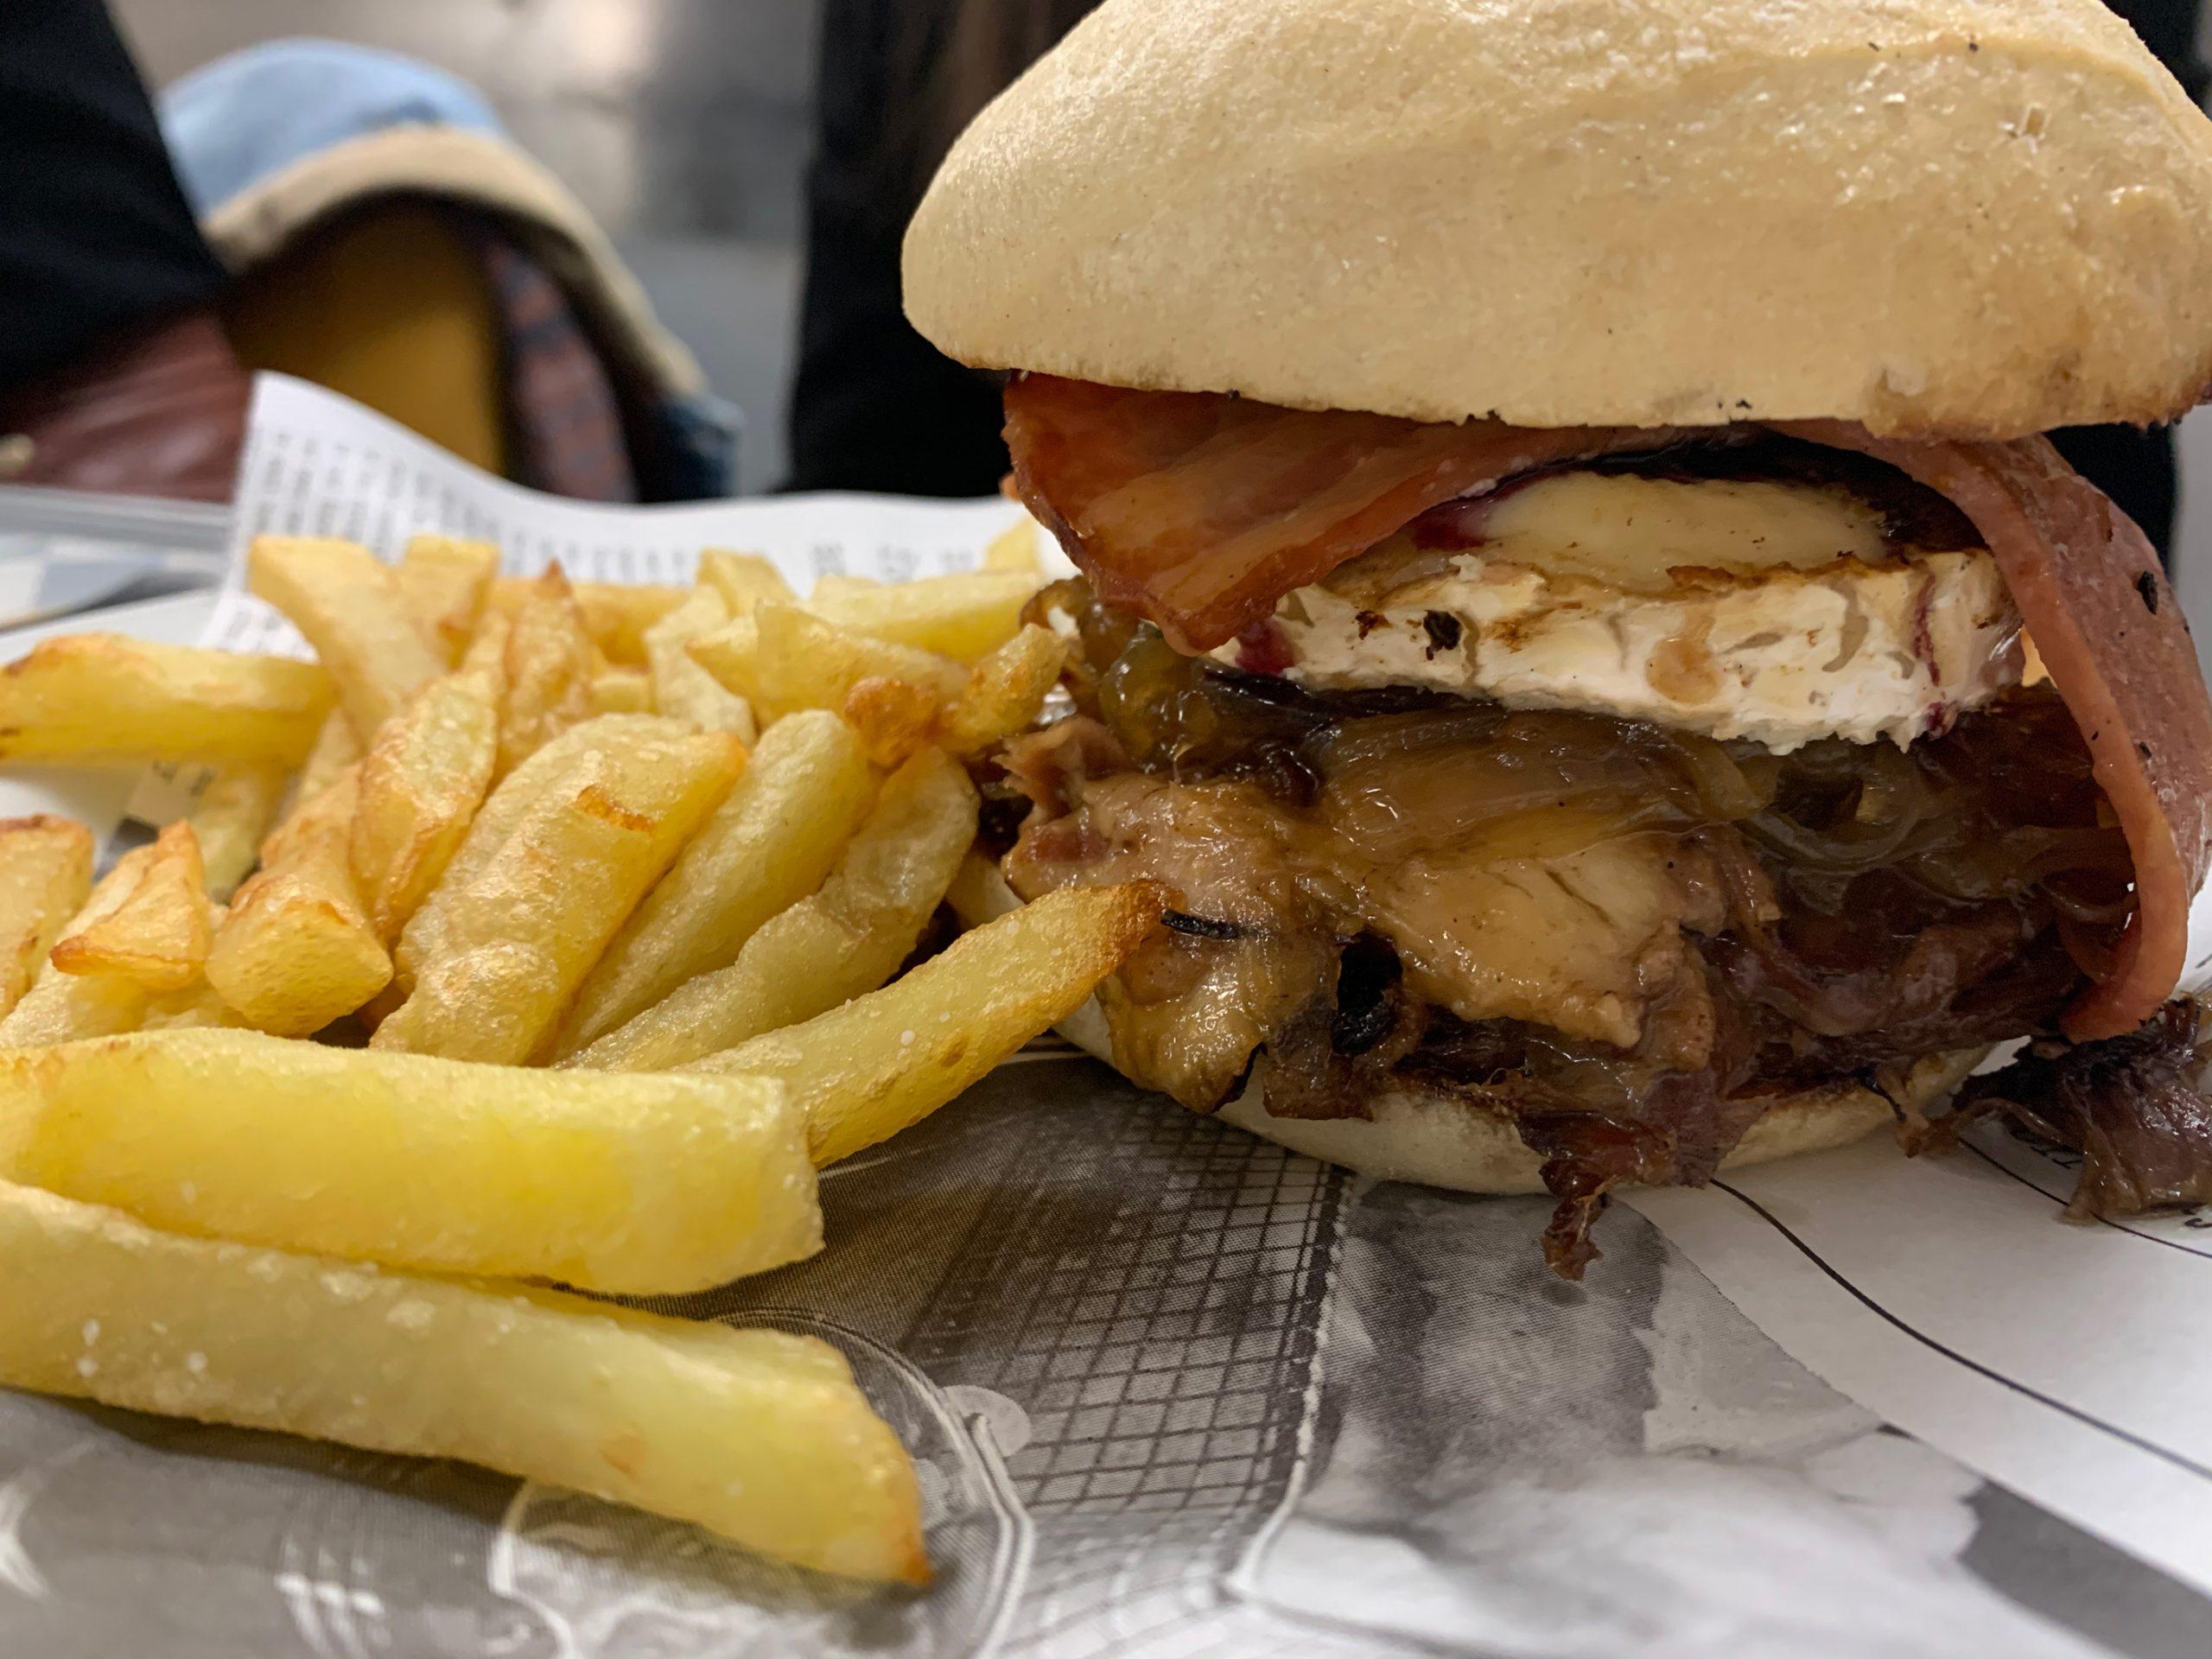 Manabamate: hamburguesas para el enamorado